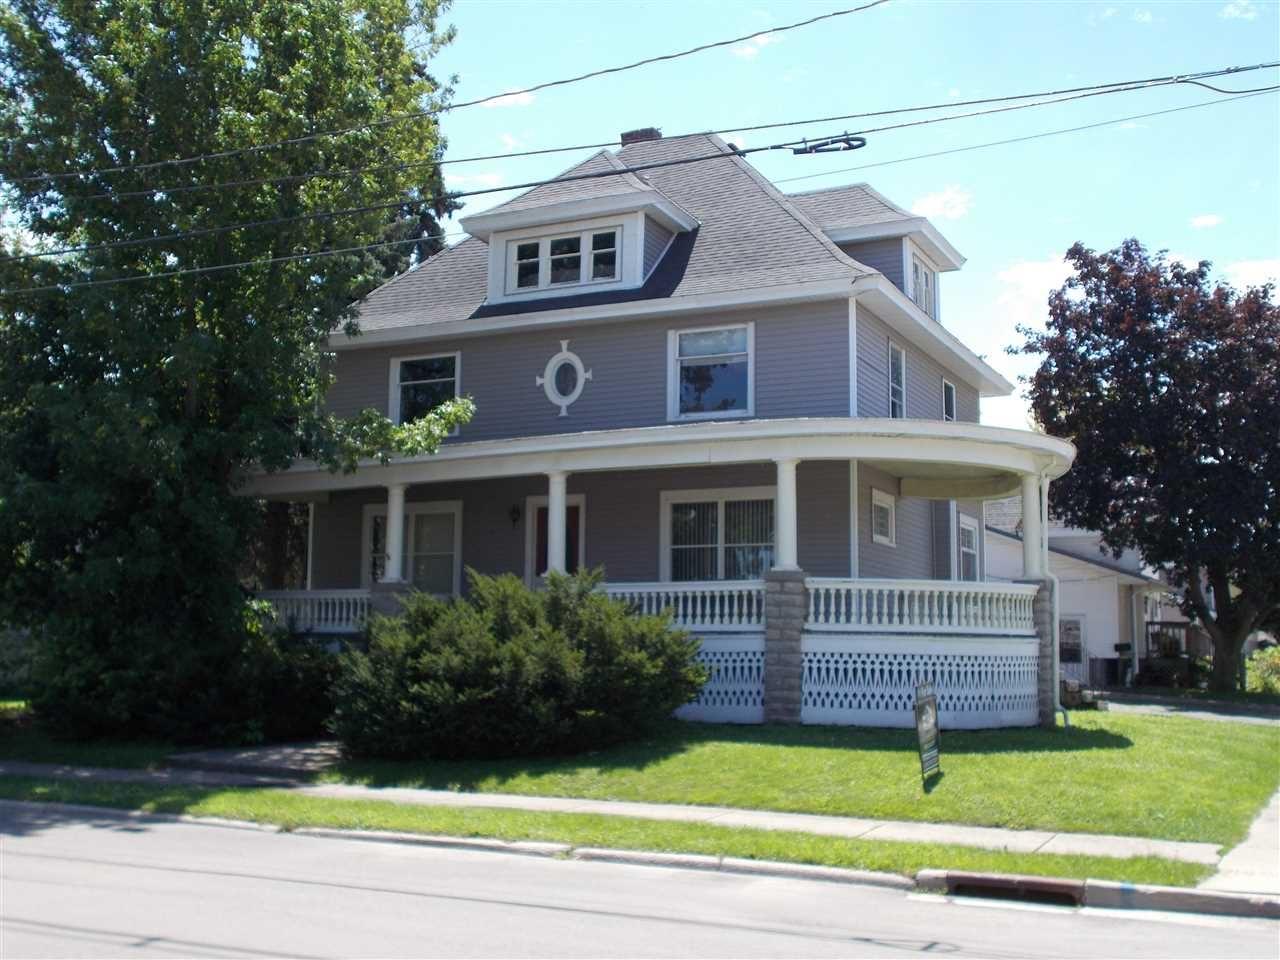 303 E Jefferson St, Waupun, WI 53963 - #: 1889357